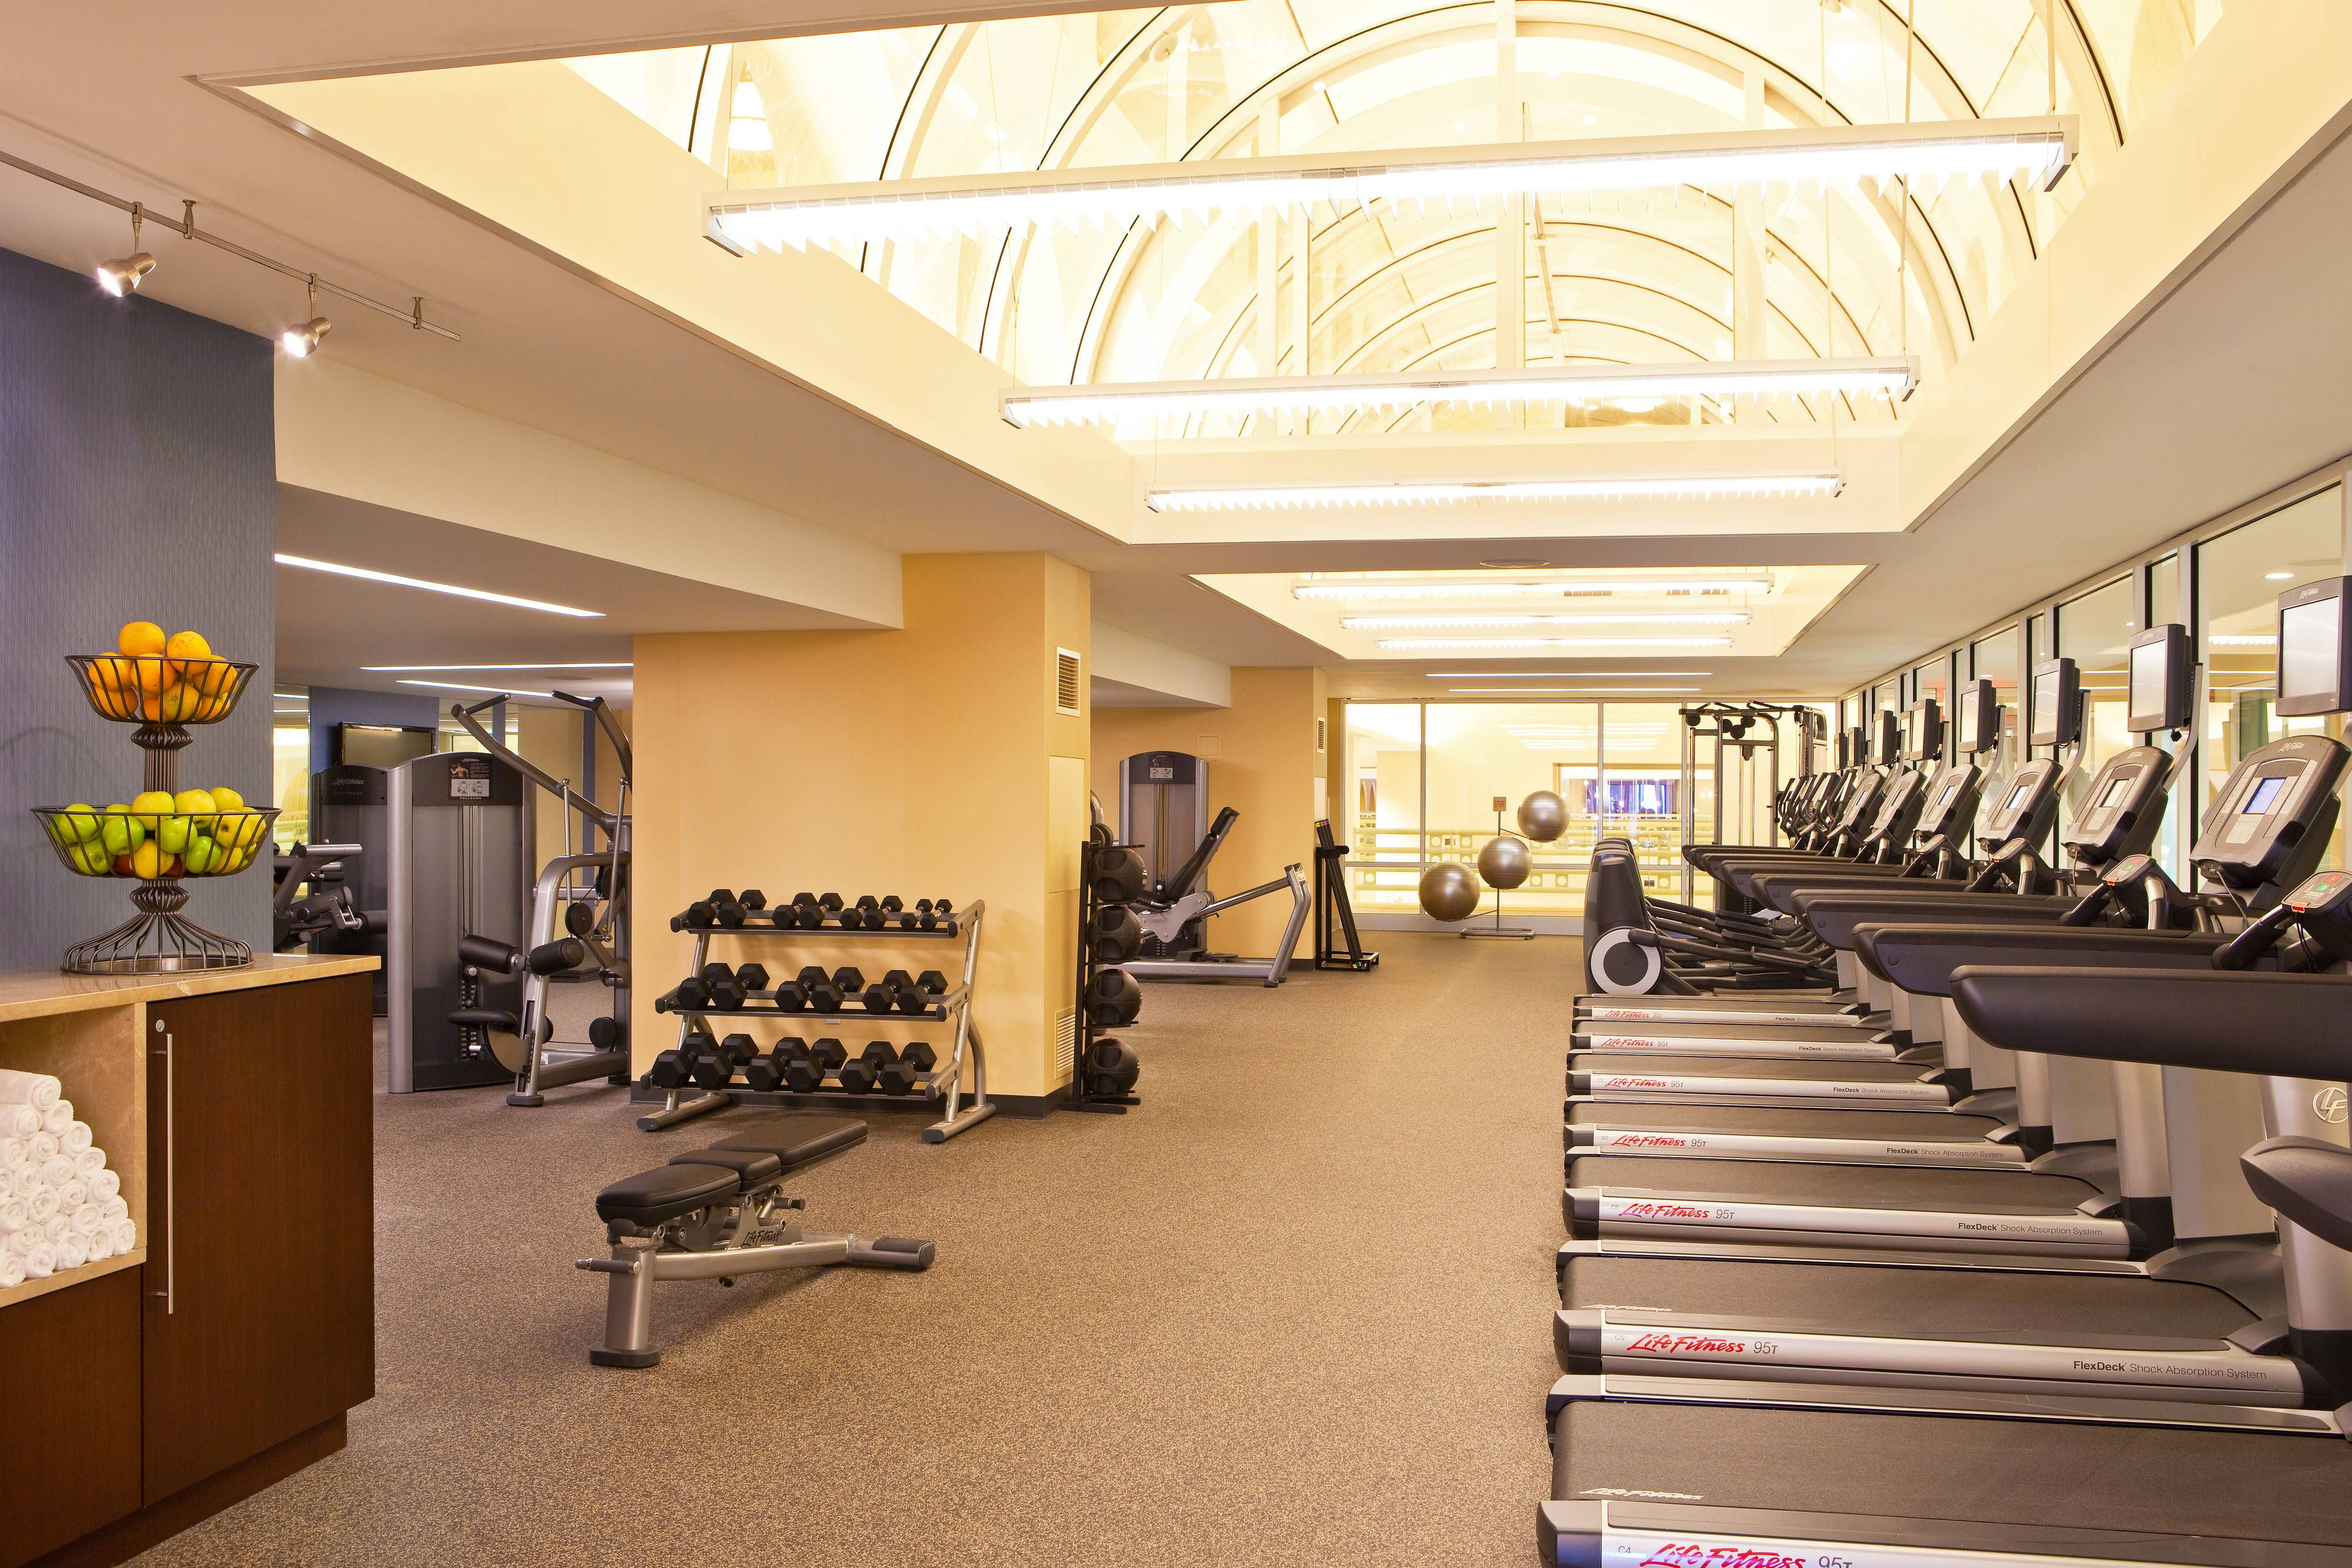 Boston Marriott Long Wharf Fitness Center Visiting Enjoy Travel Marriott Hotel Travel Photography